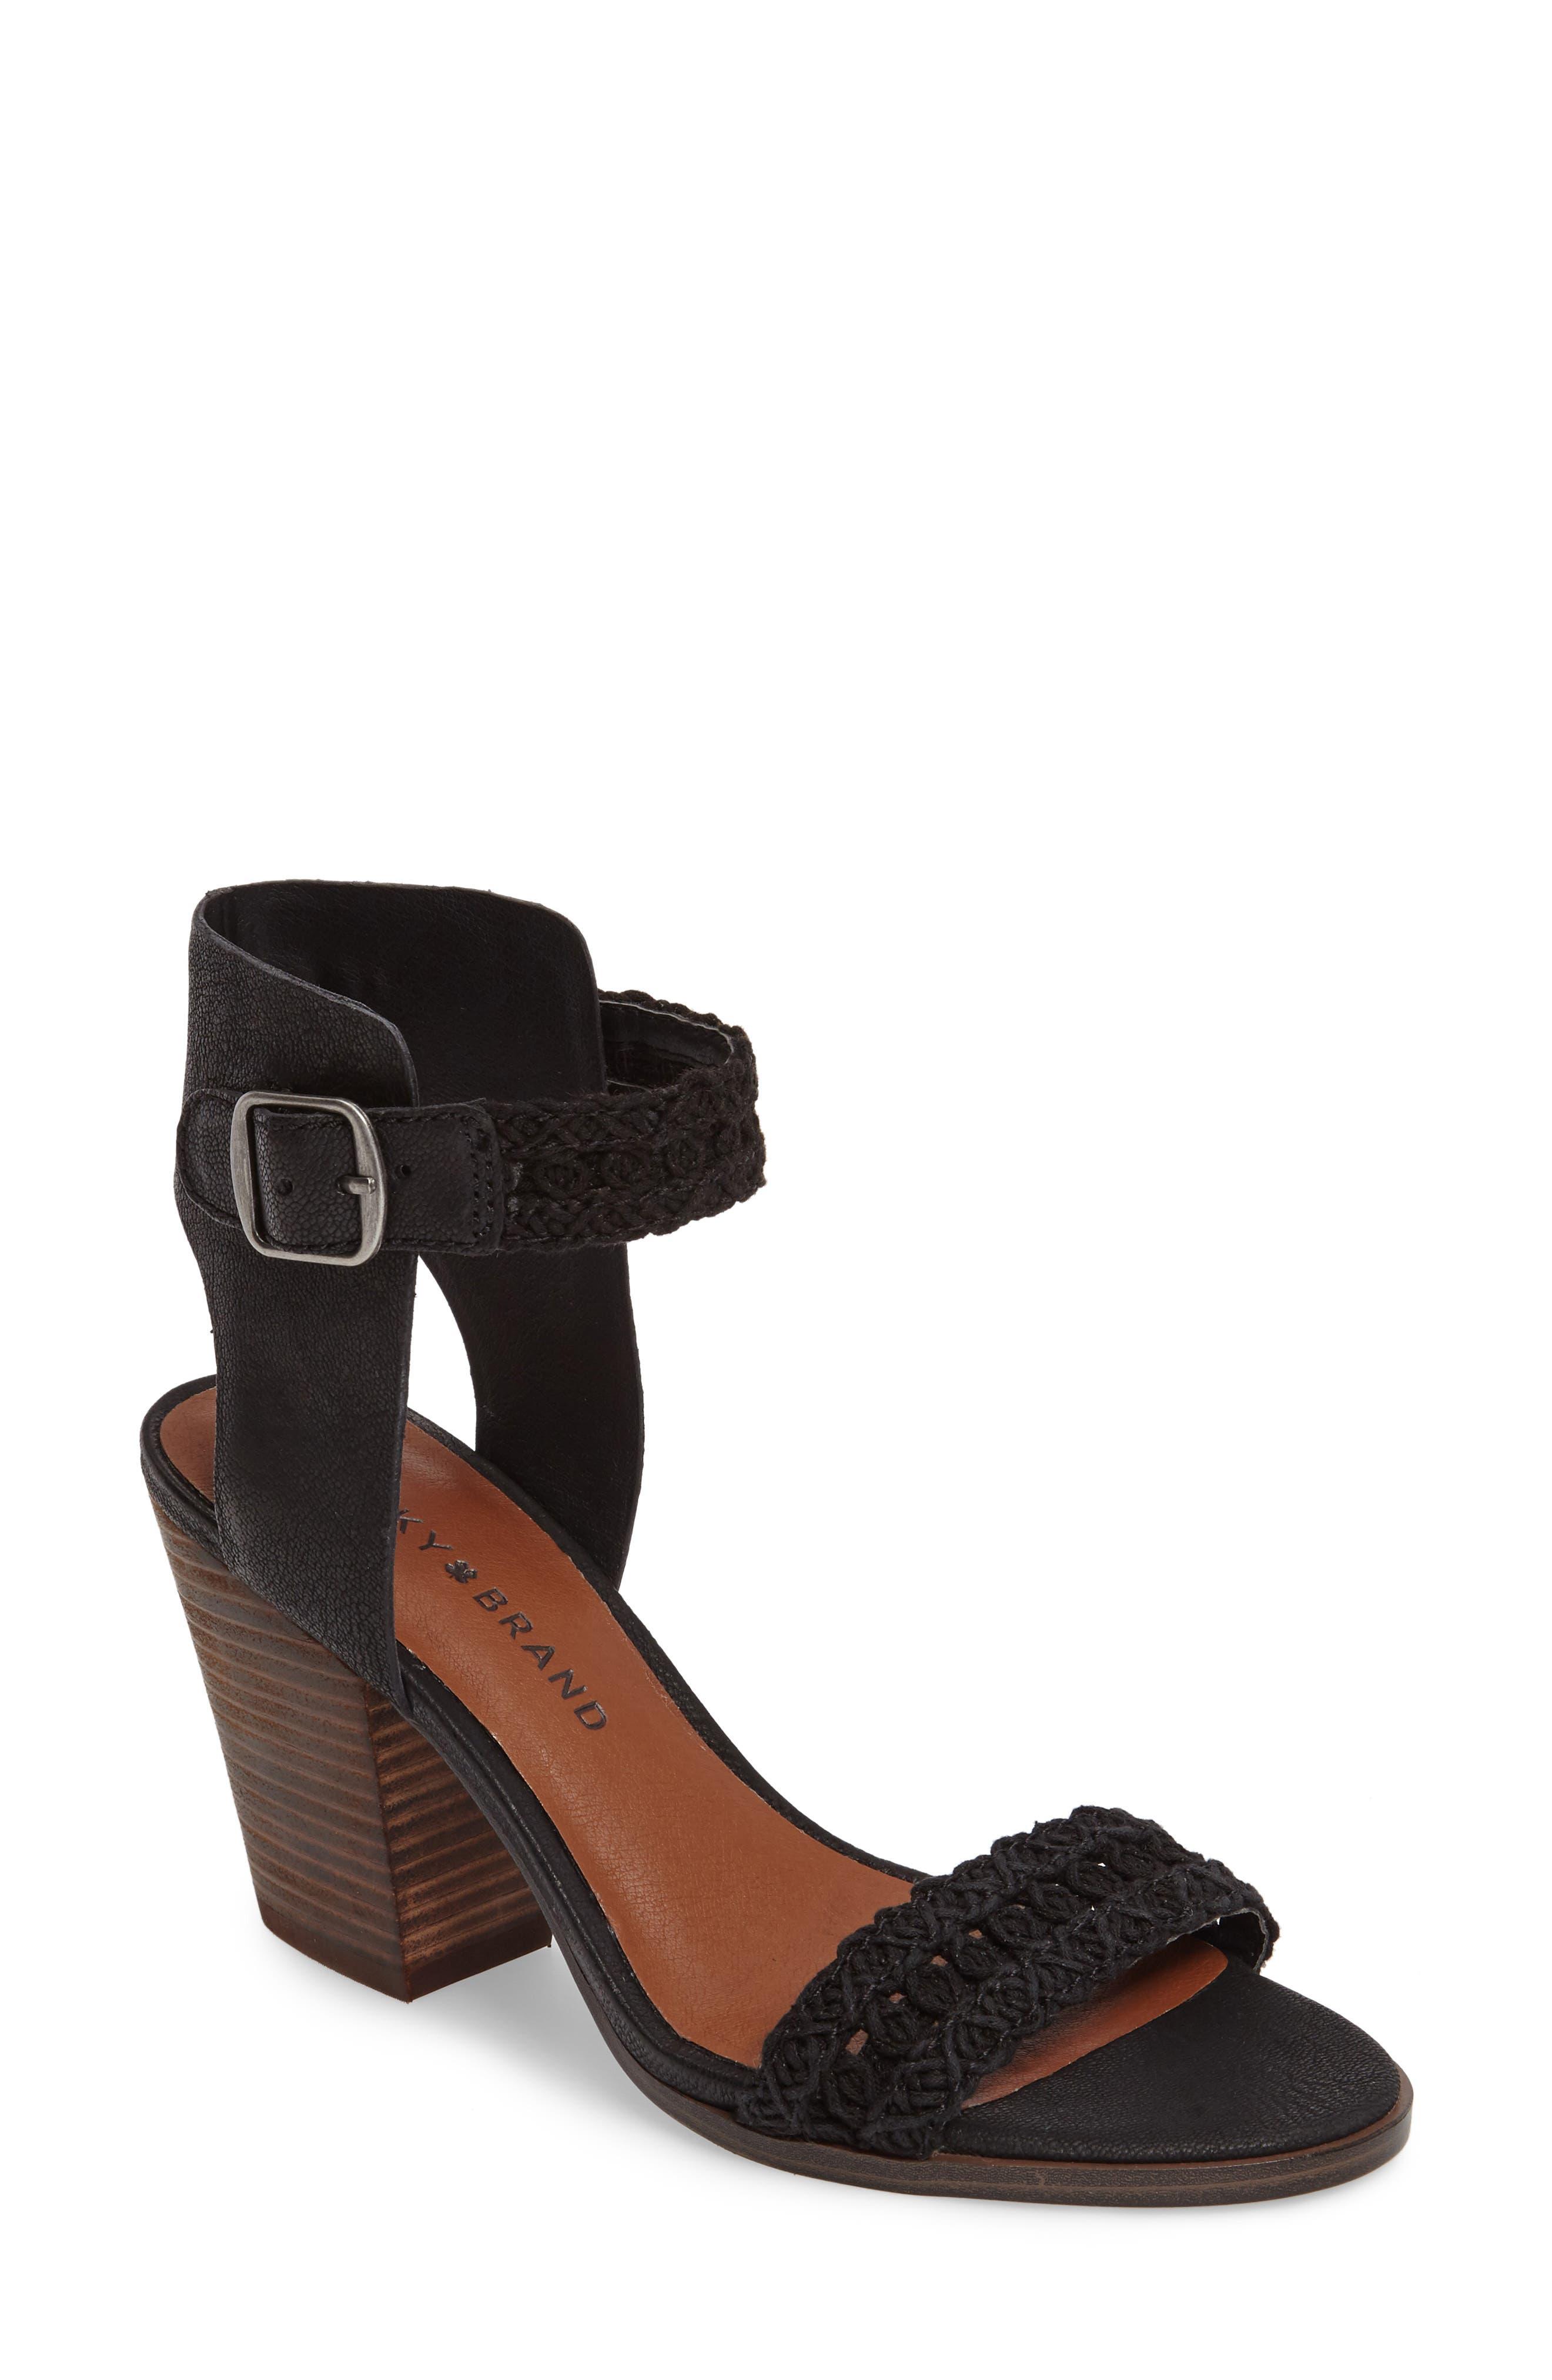 Oakes Ankle Strap Sandal,                         Main,                         color, 001